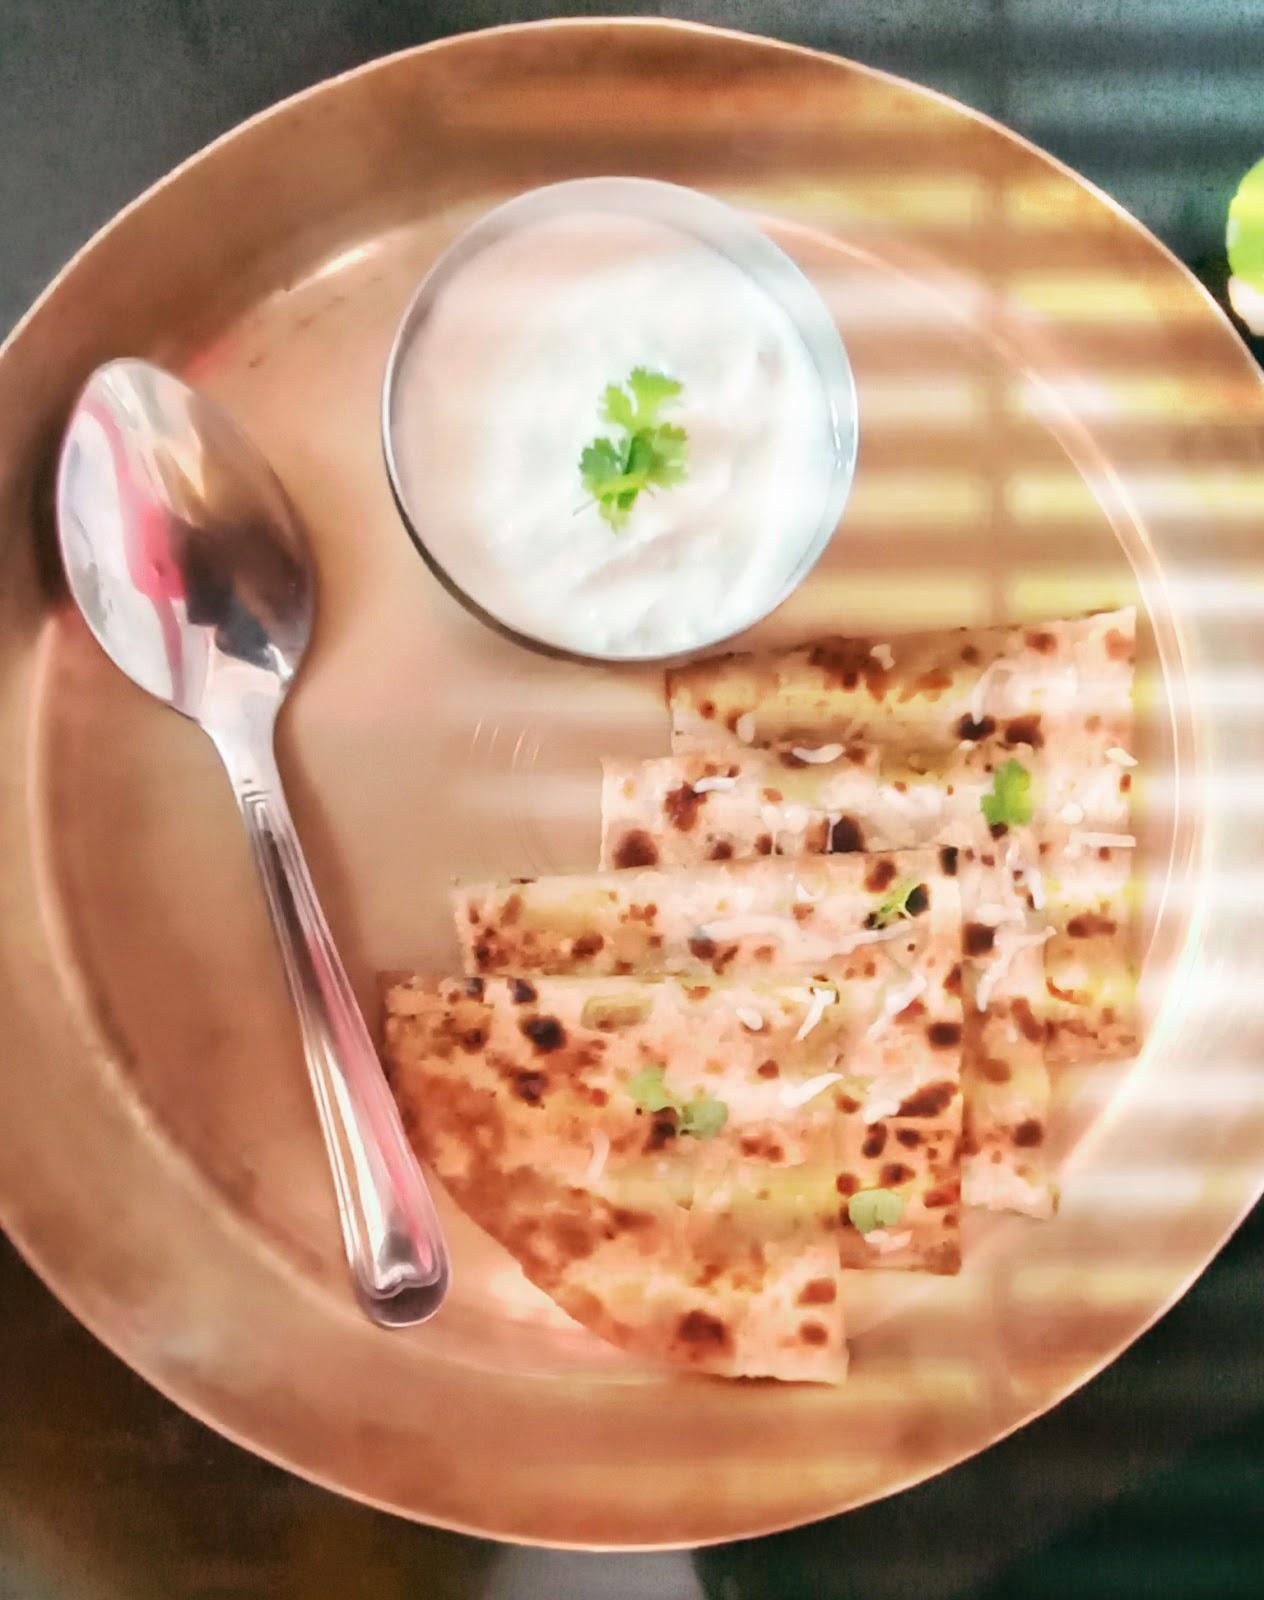 simple chole recipe in hindi सिंपल छोले रेसिपी